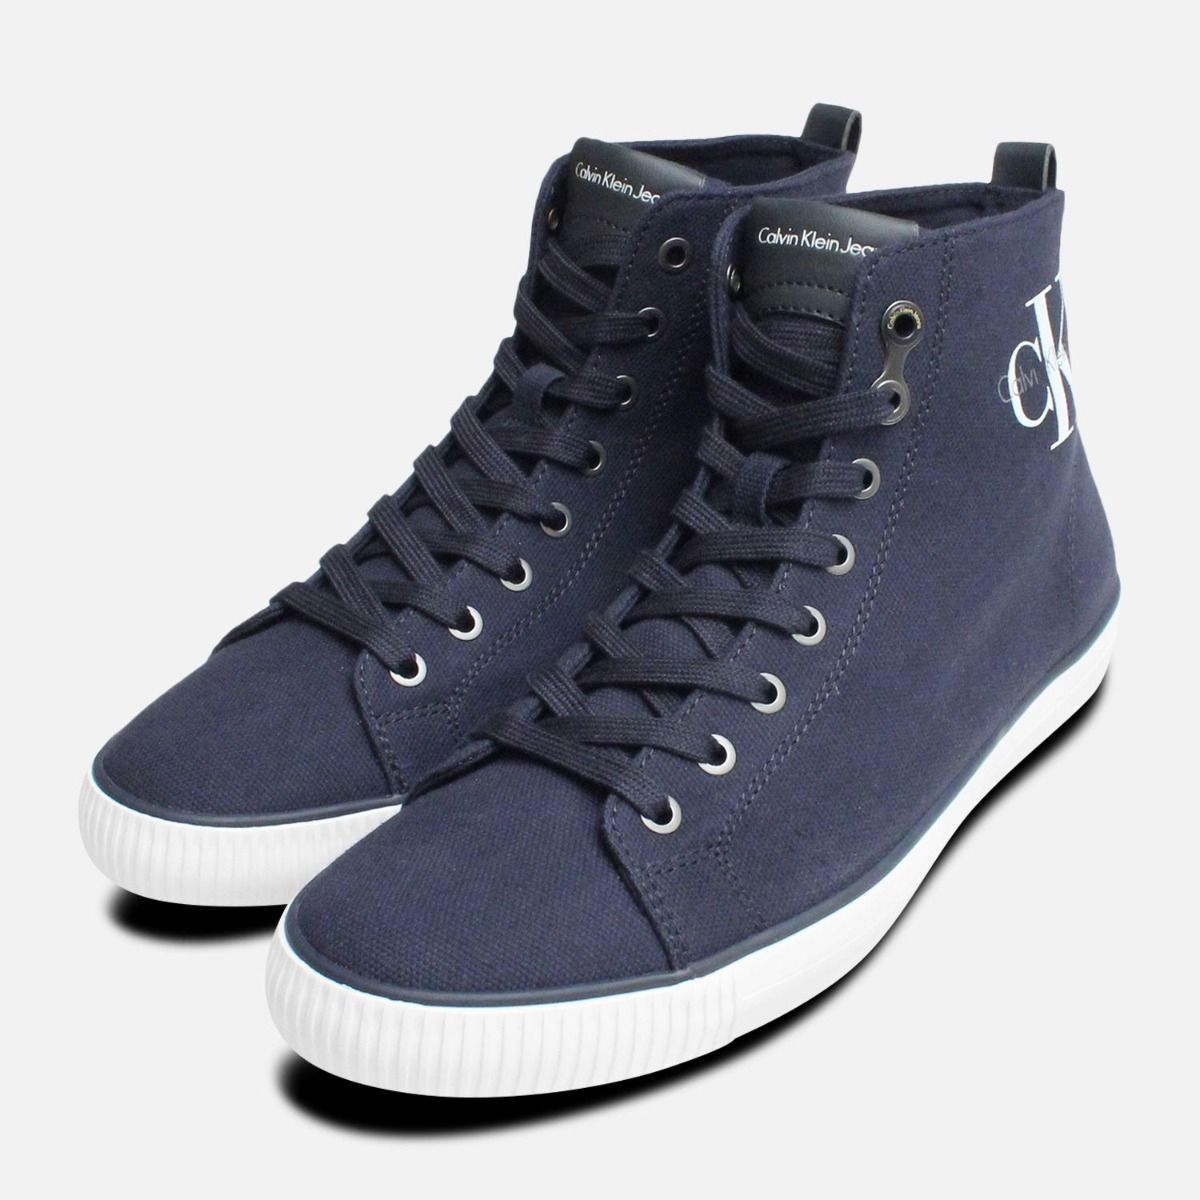 01ad4dcb15d8 Navy Blue Arthur Hi Tops by Calvin Klein Shoes S0367